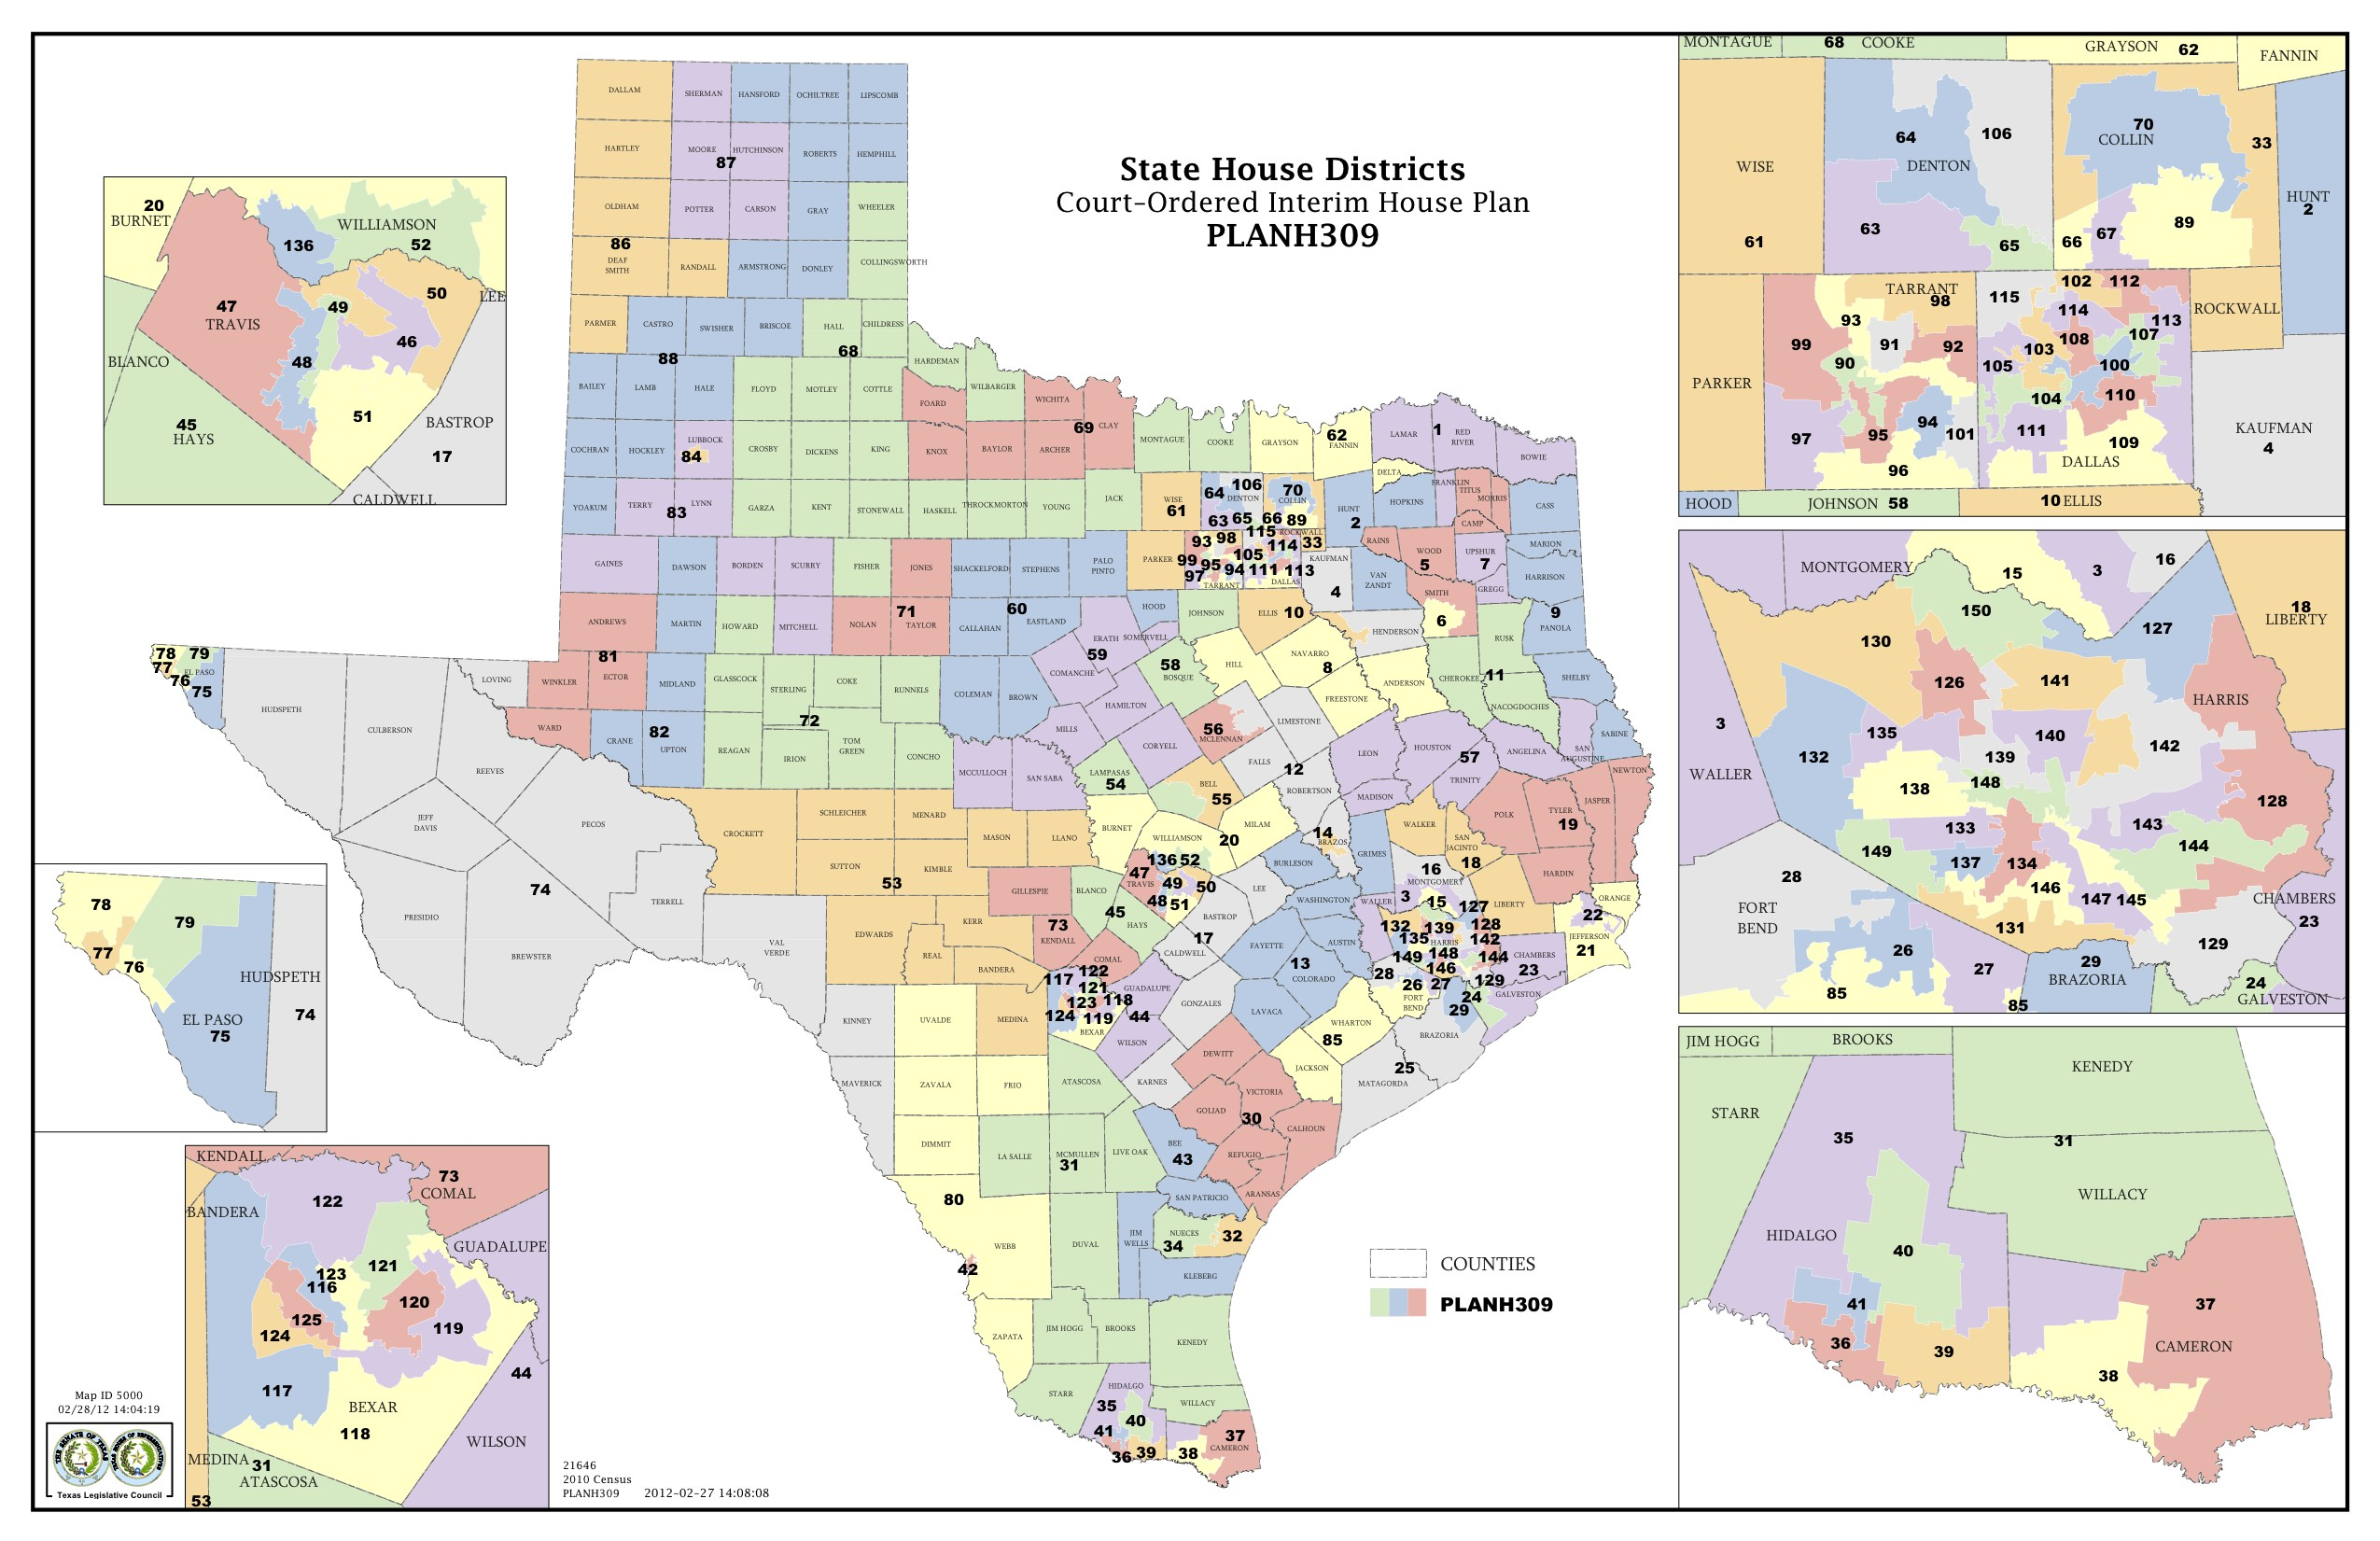 Texas Us Senate District Map New State Senate Awesome Map Texas - Texas Us Congressional District Map